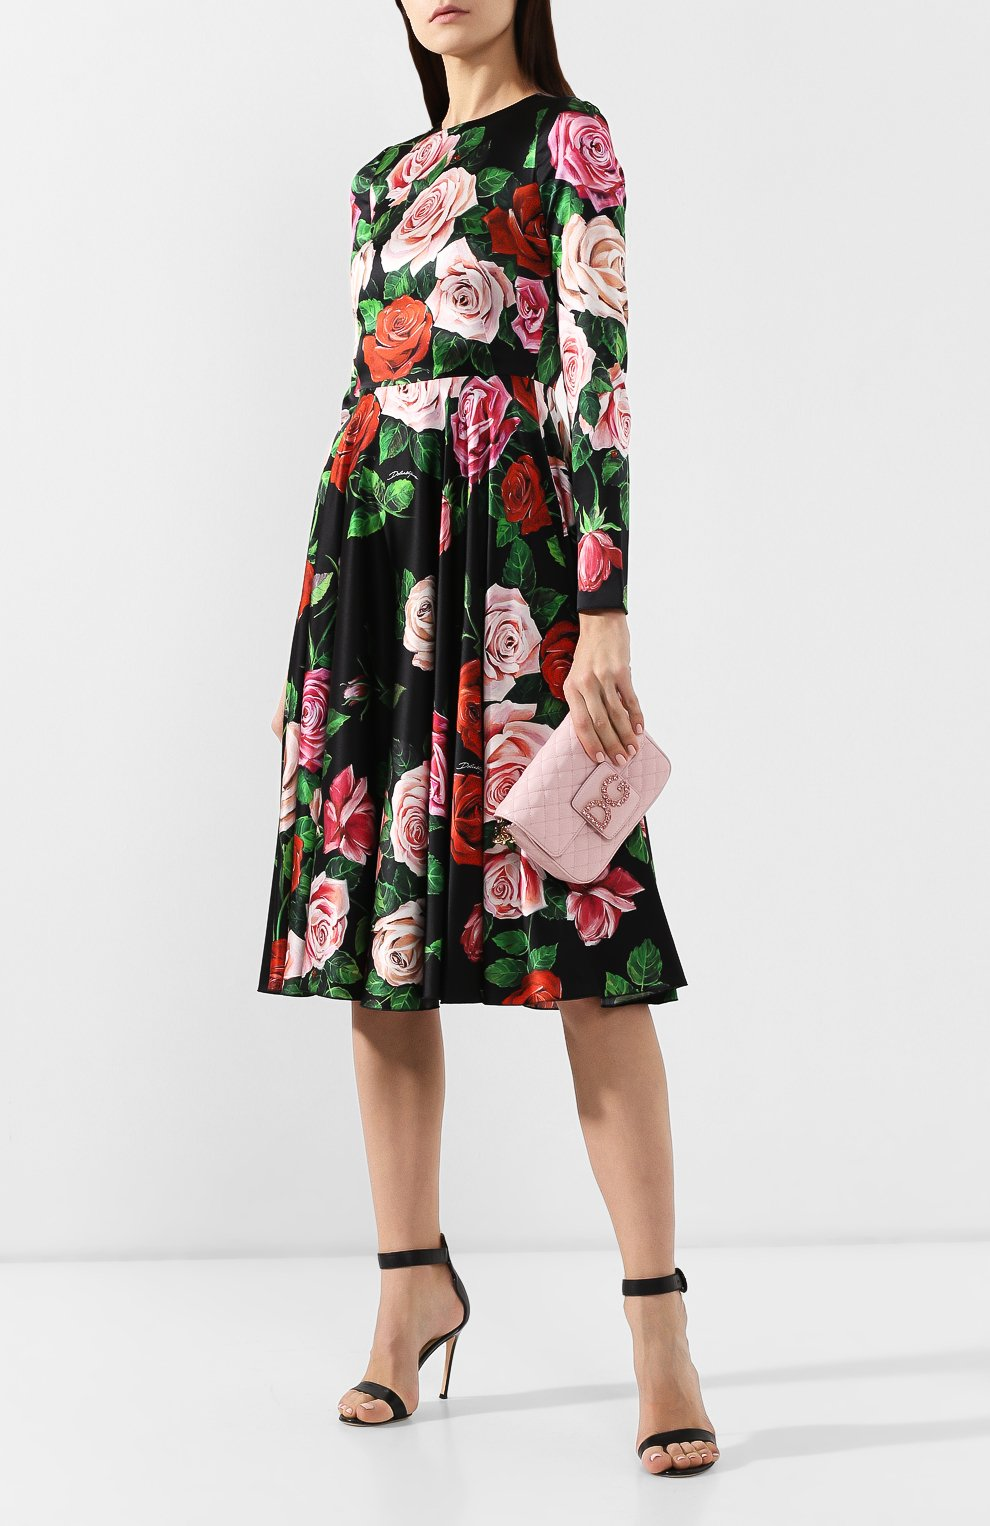 Сумка DG Millennials Dolce & Gabbana светло-розовая цвета   Фото №2